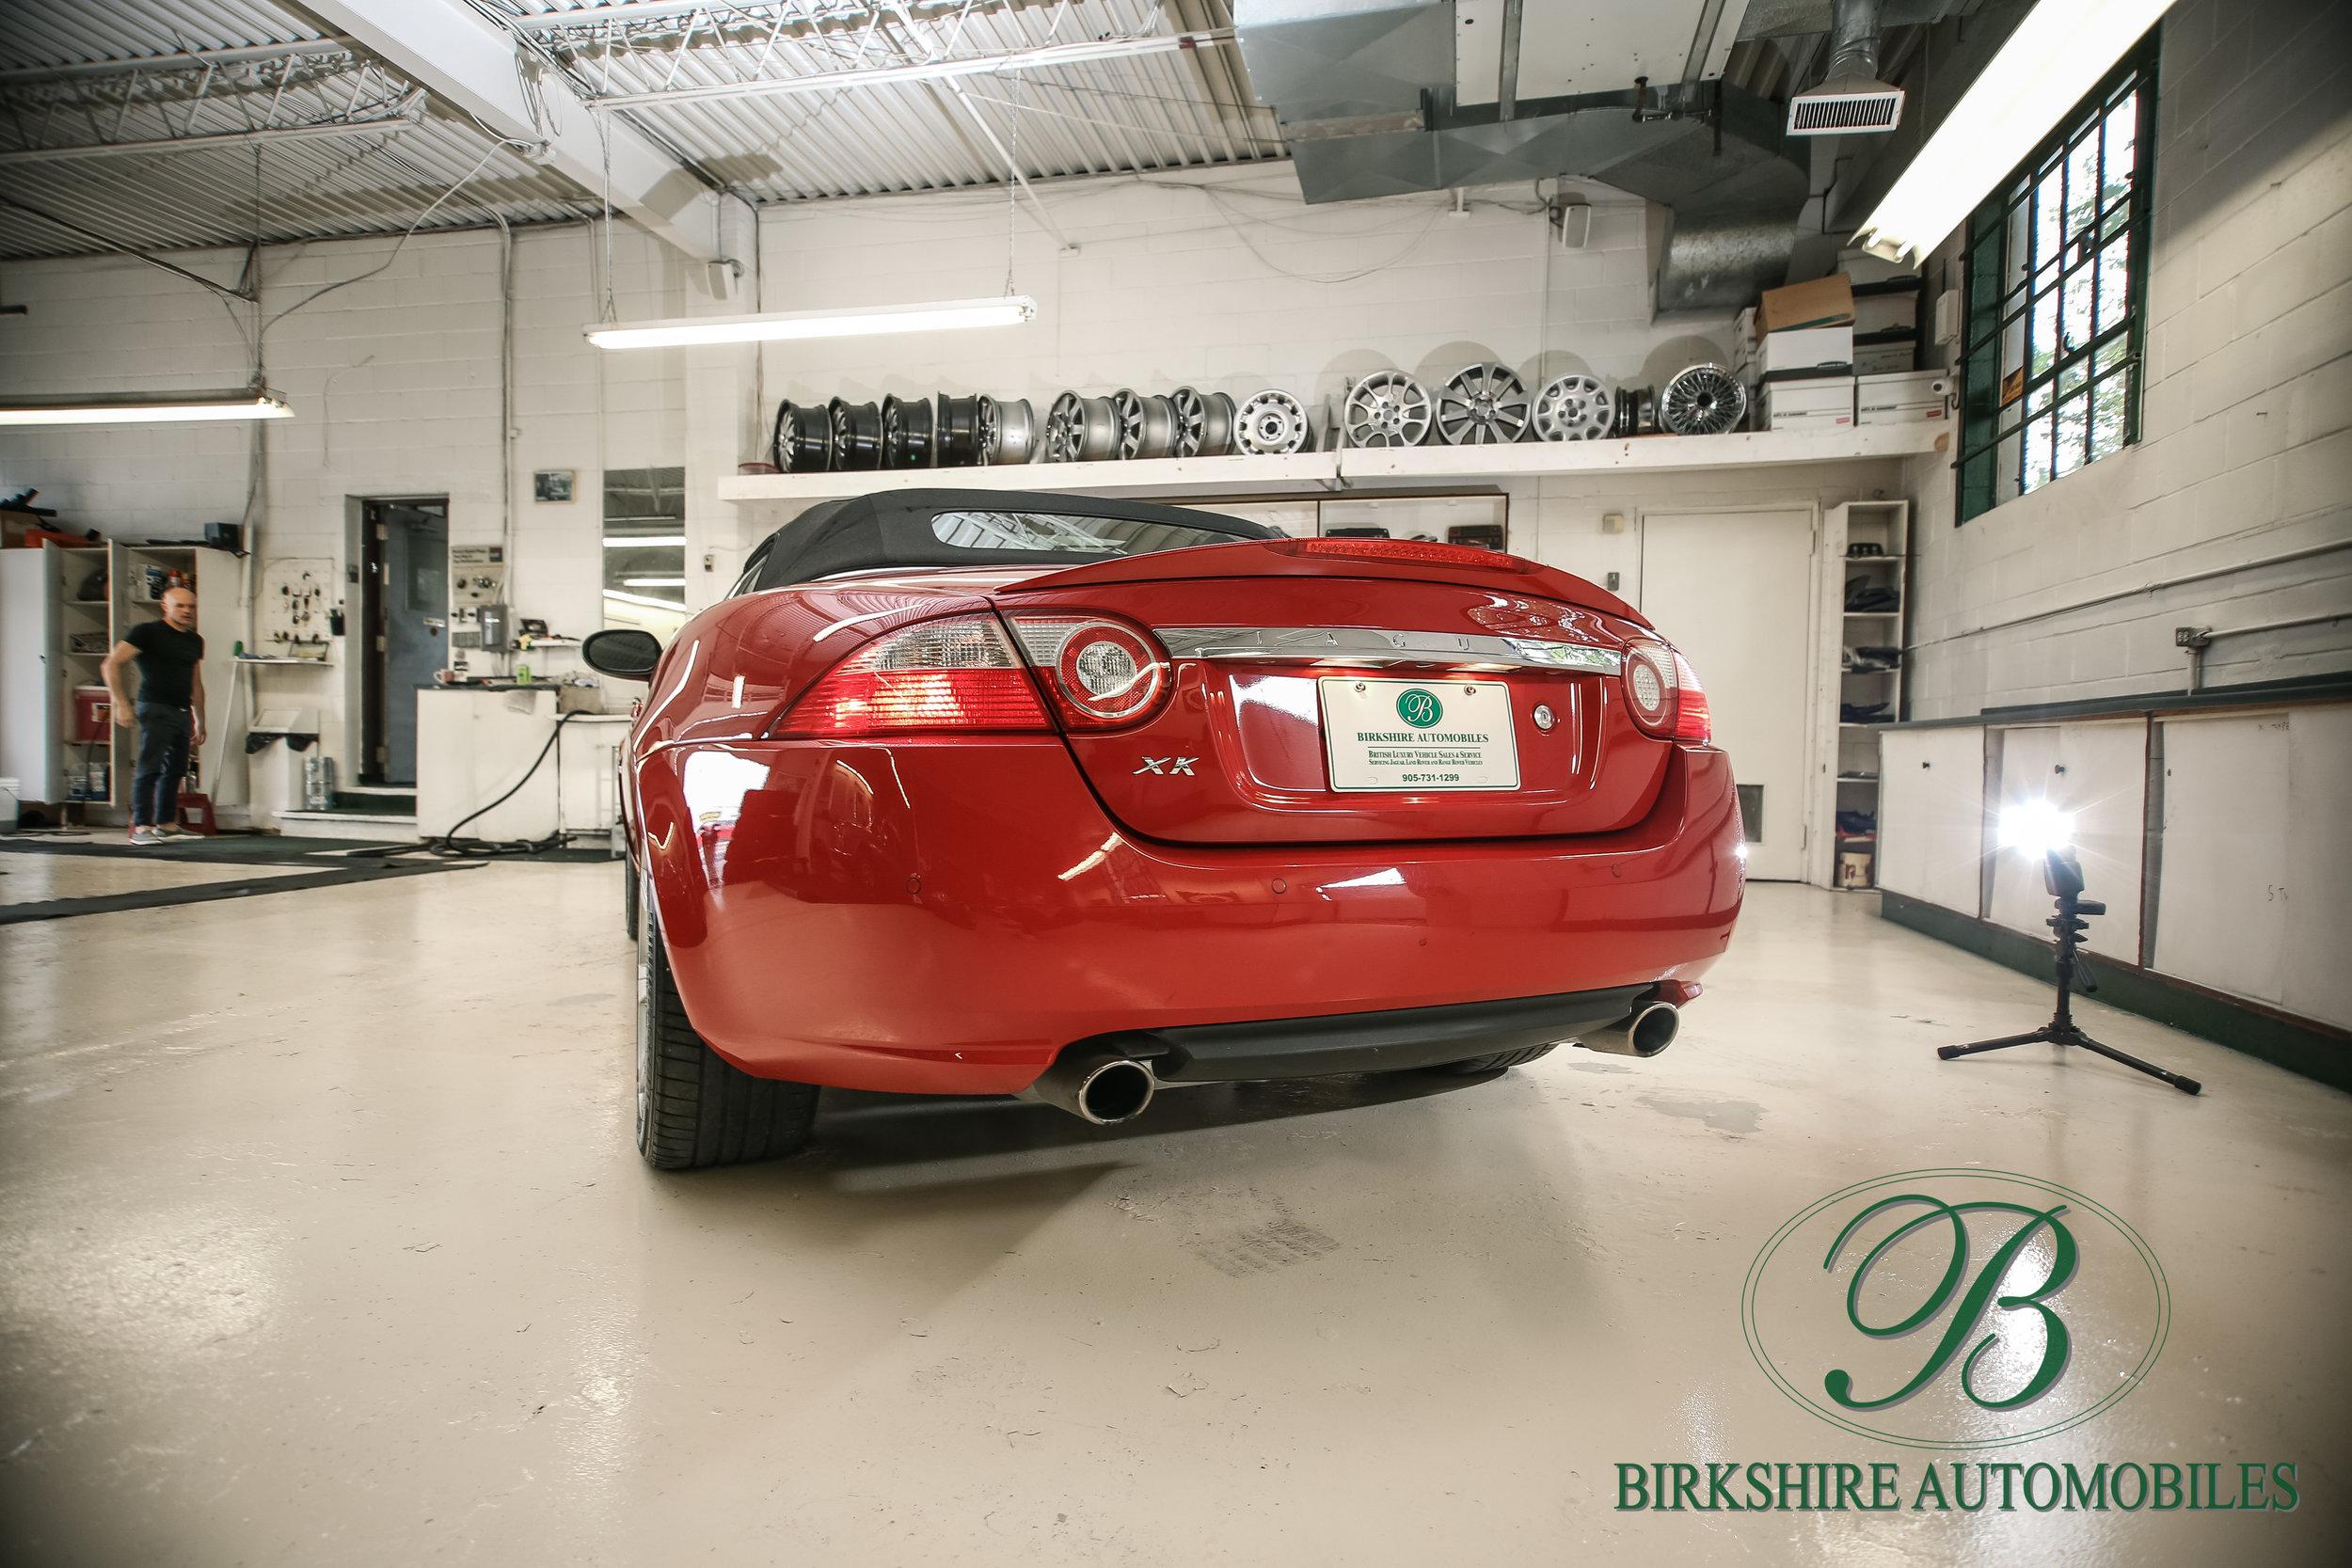 Birkshire Automobiles-73.jpg